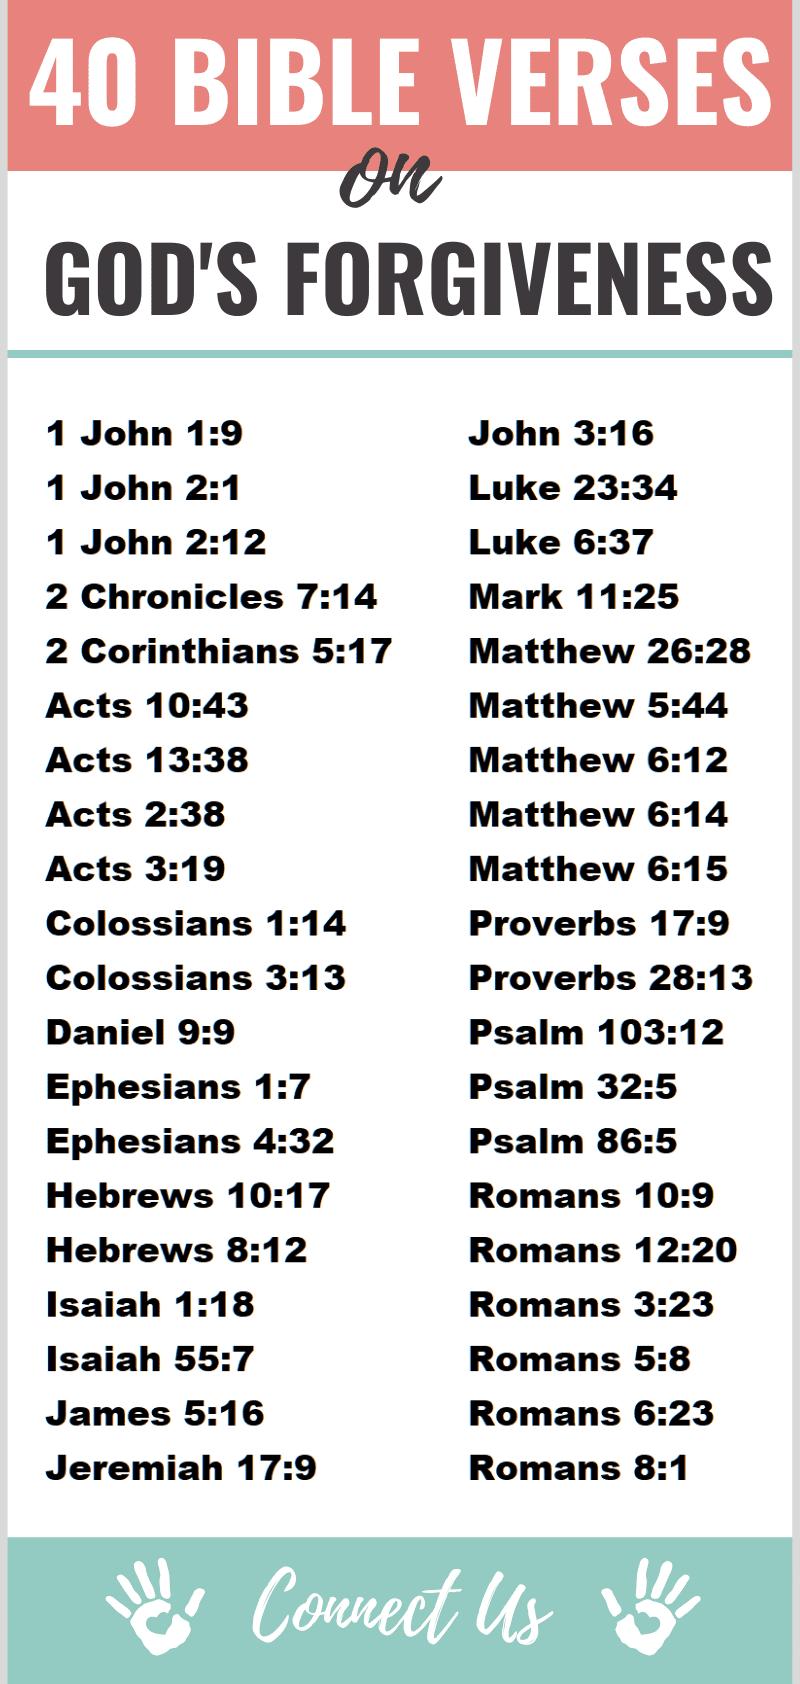 Bible Verses on God's Forgiveness